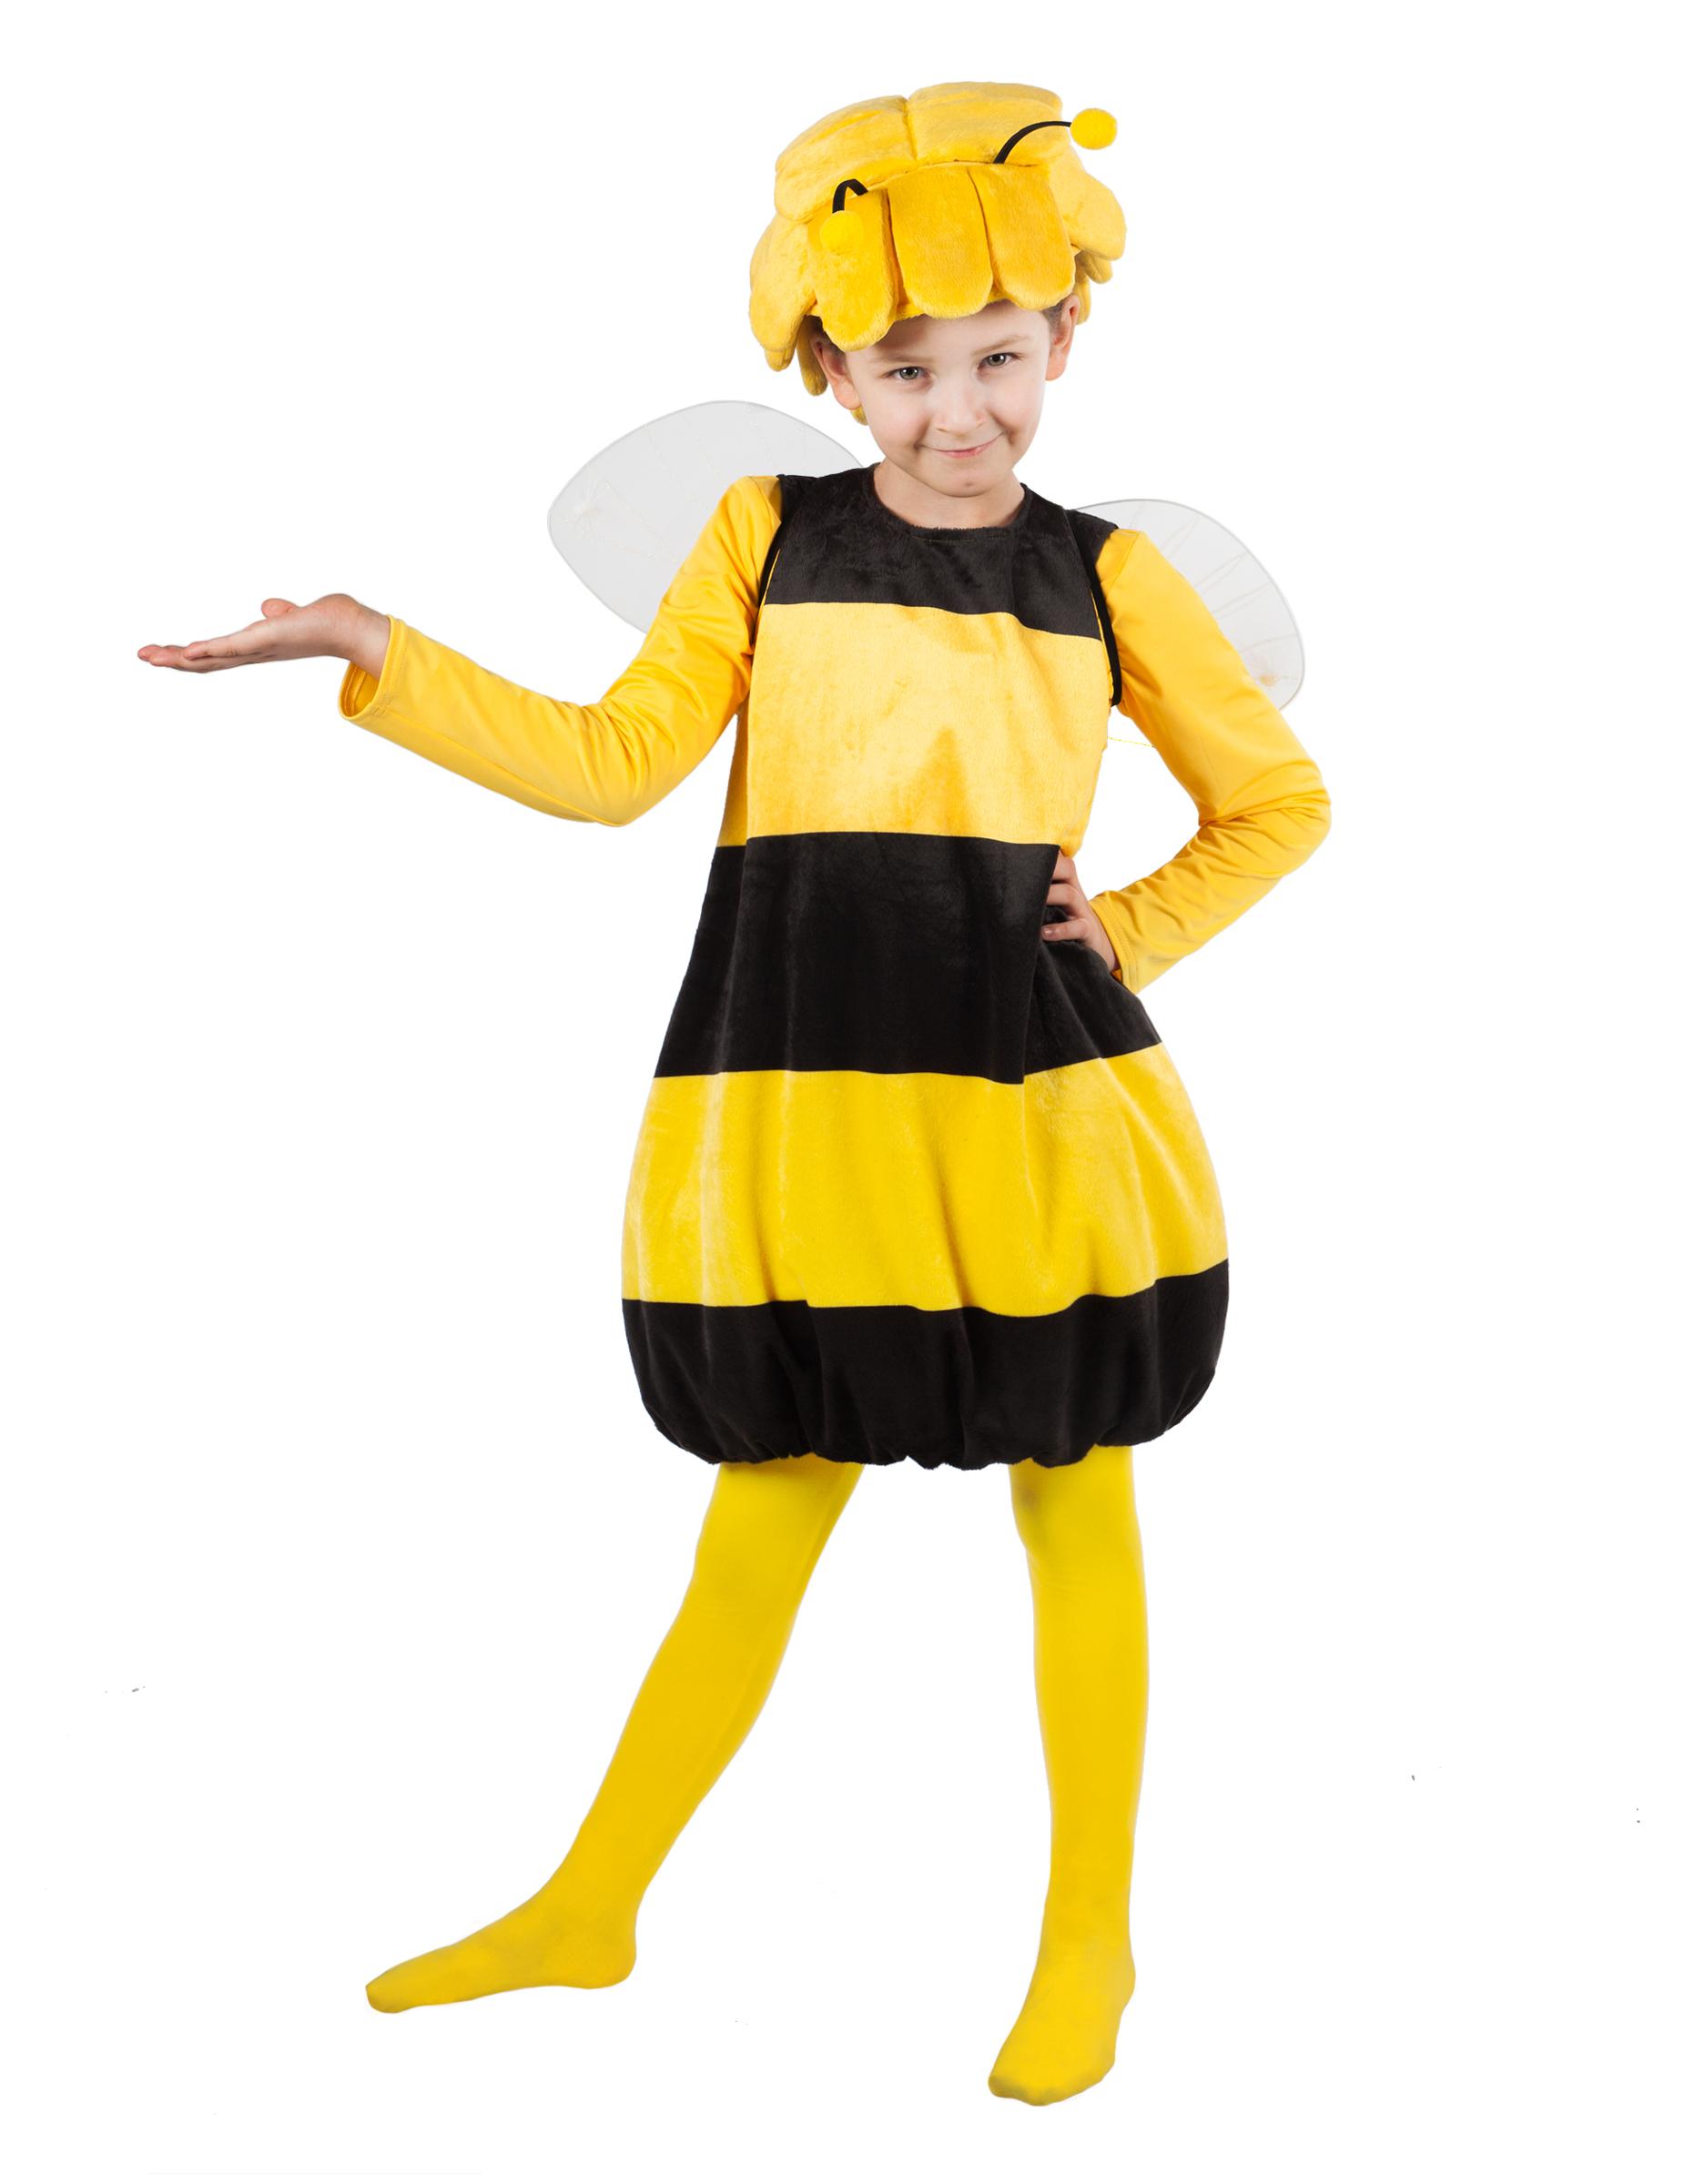 Biene Maja Kinderkostum Lizenz Verkleidung Gelb Schwarz Kostume